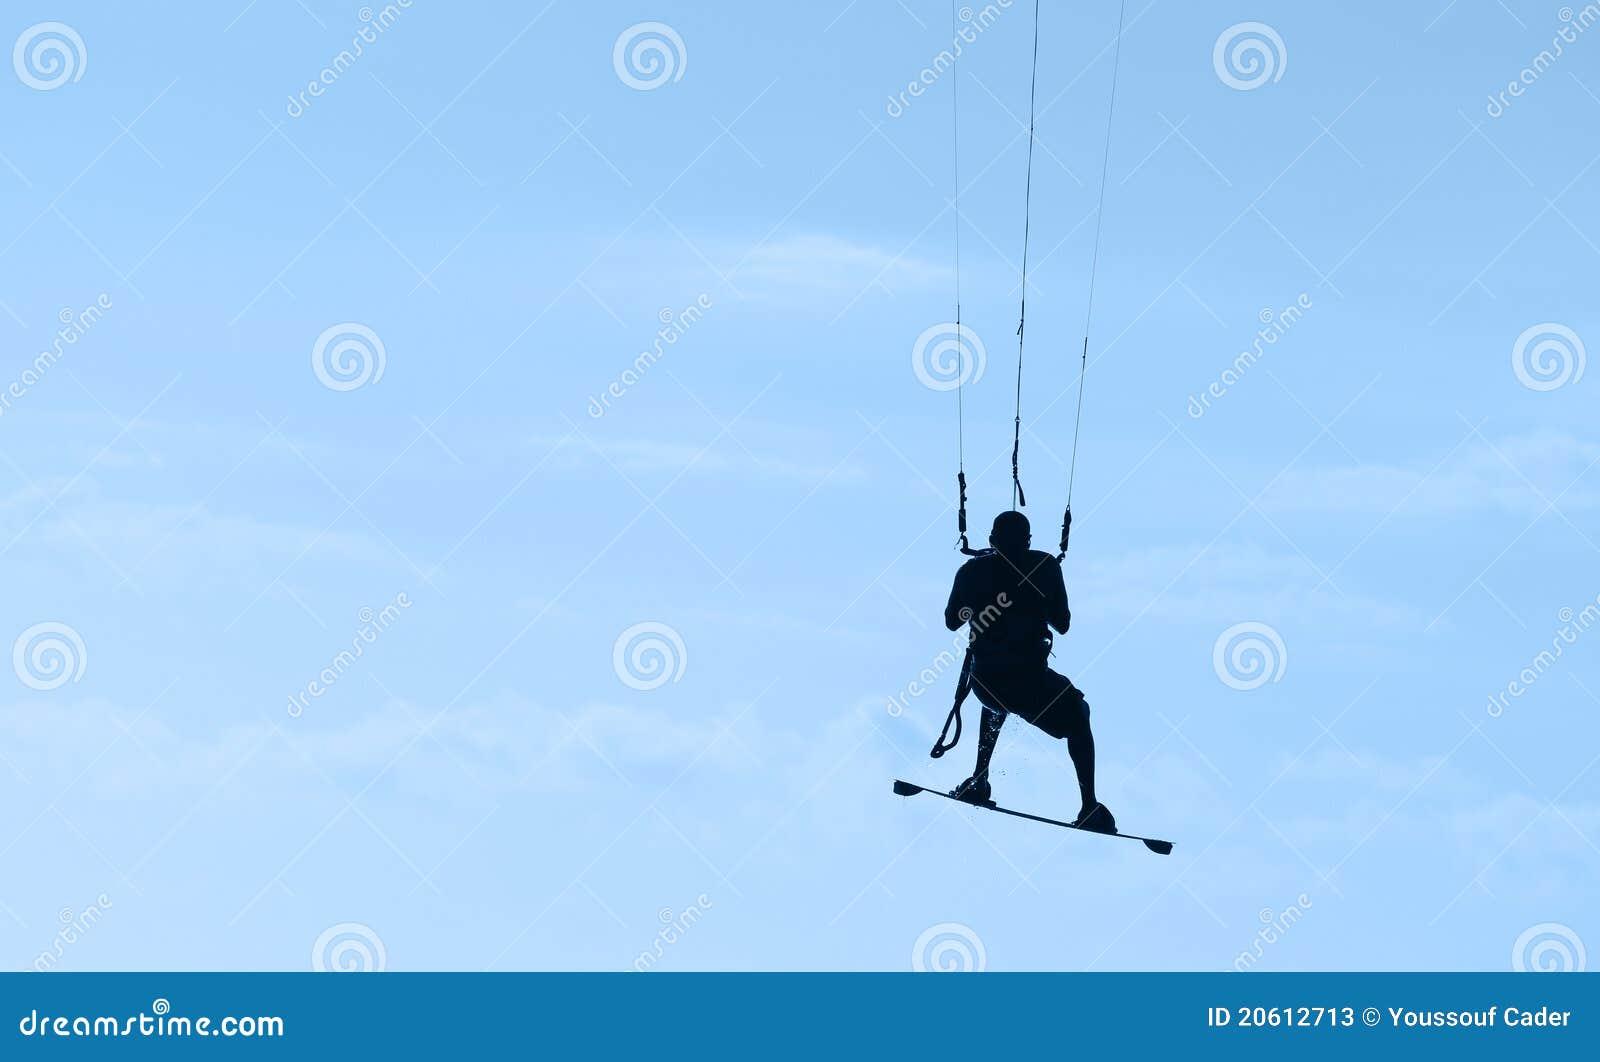 Kitesurfing mauritius